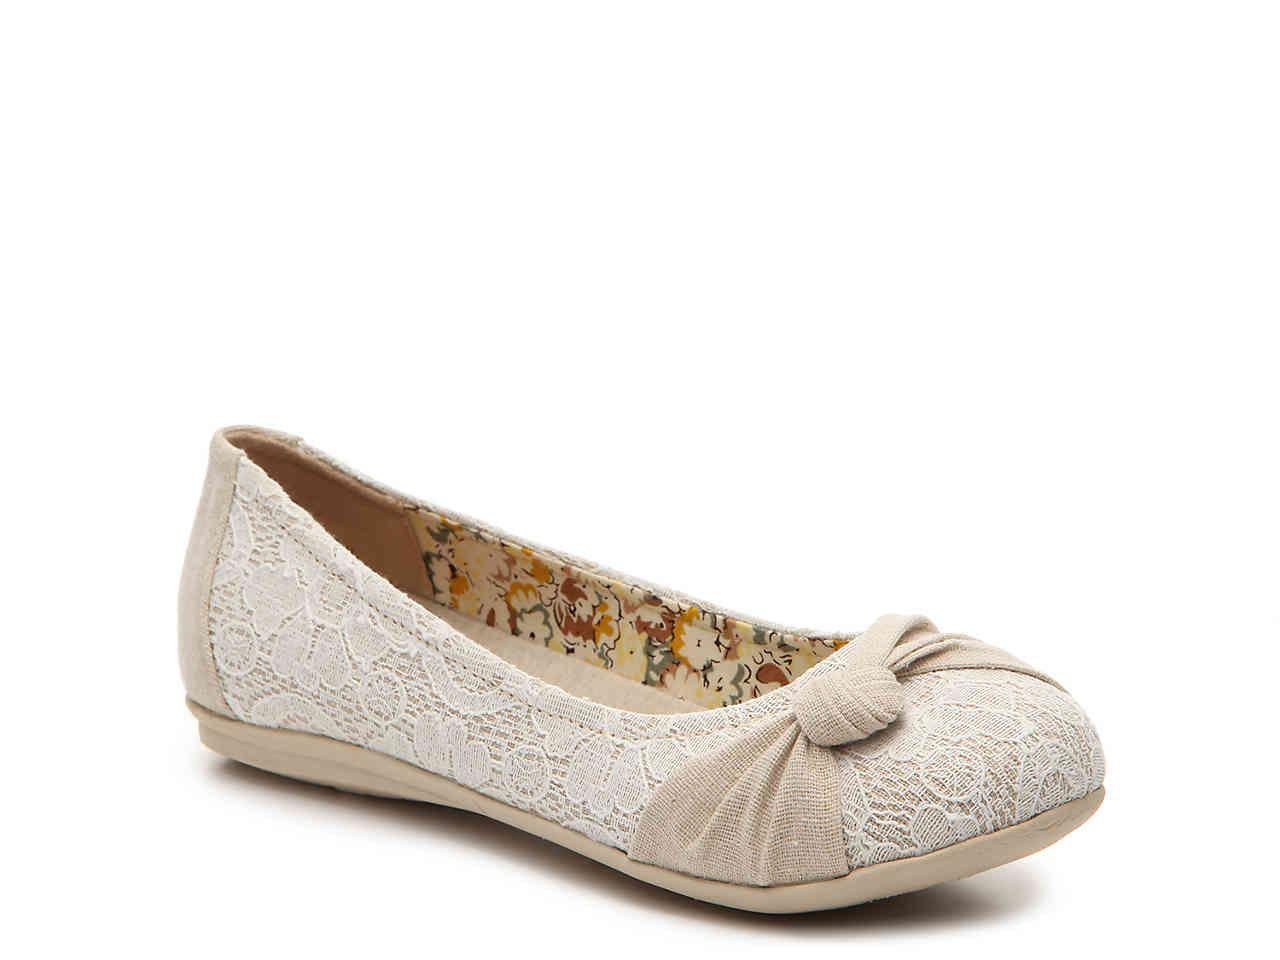 Zeva Ballet Flat Flats Jellypop Shoes